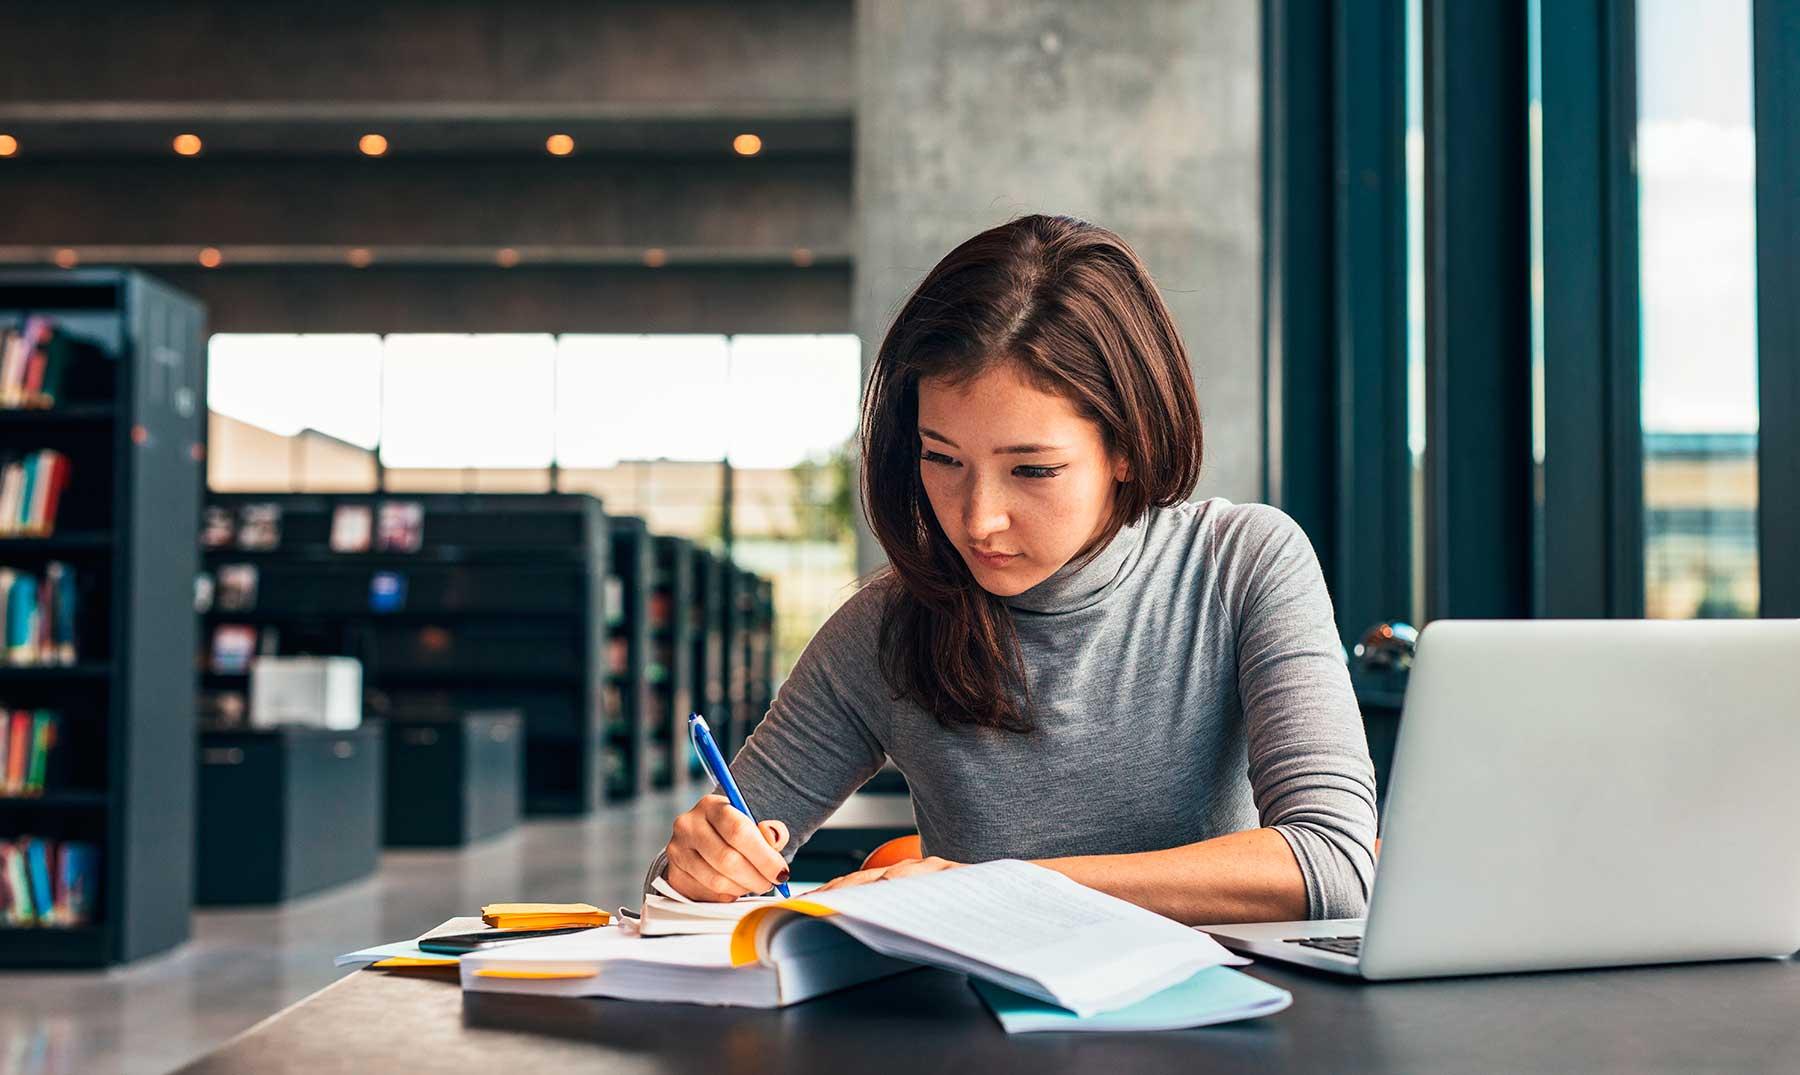 100 Frases Para Estudiantes Que Te Motivarán Con Imágenes